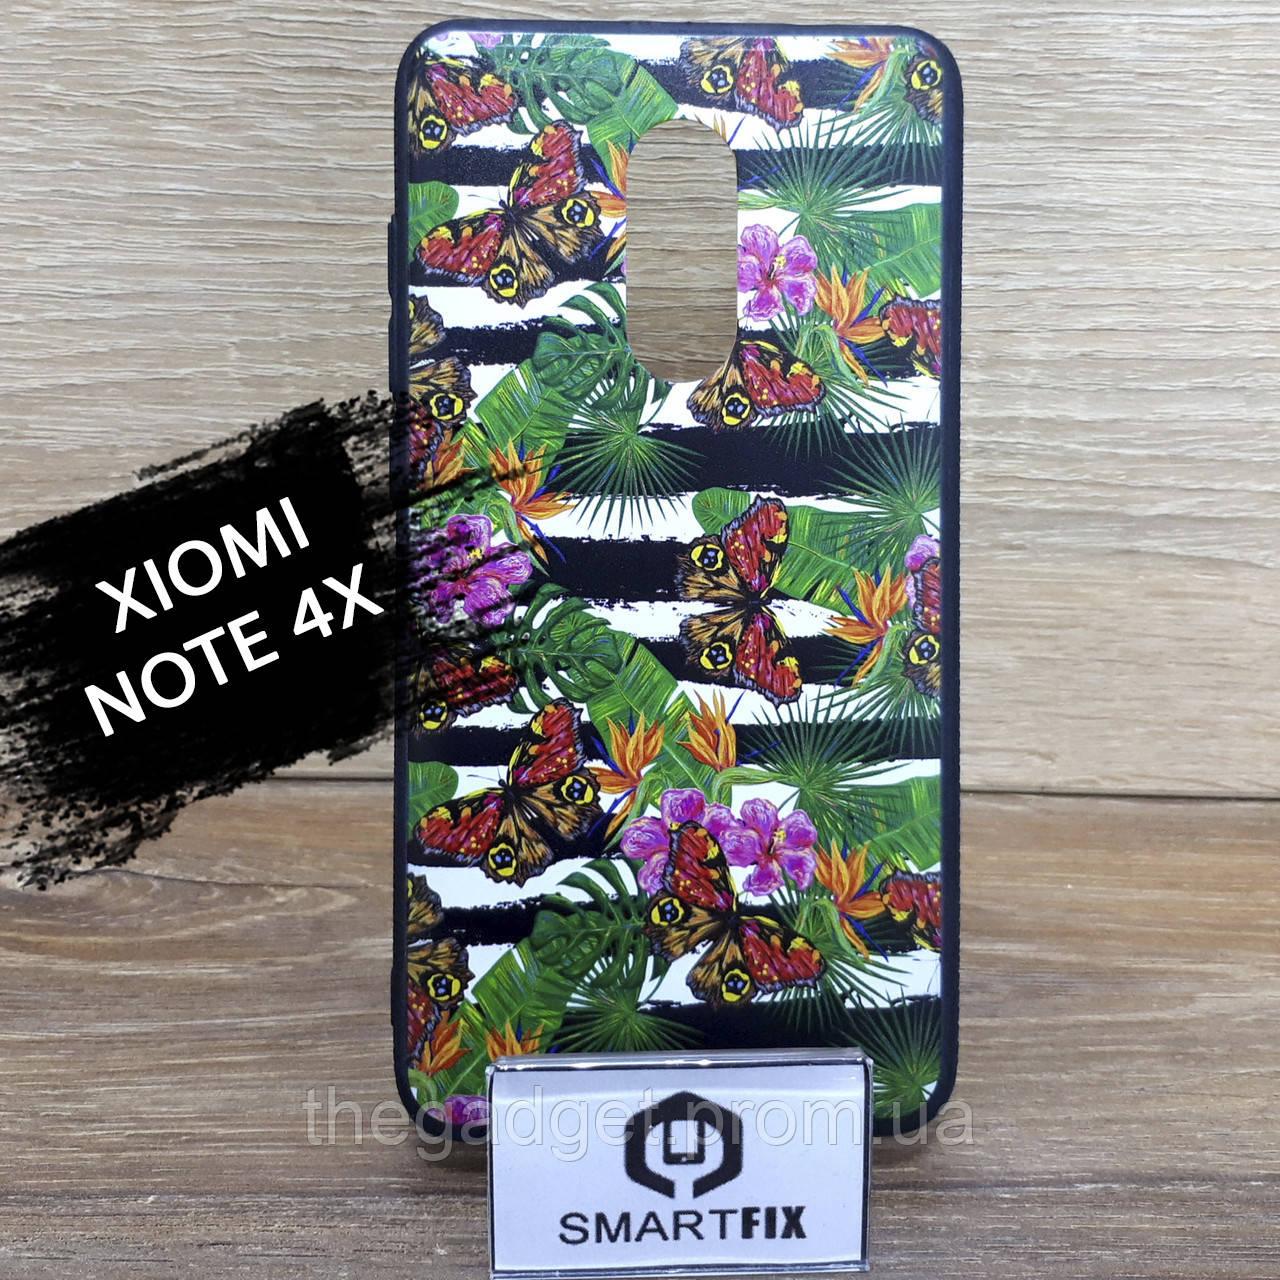 Чохол з малюнком для Xiaomi Redmi Note 4X